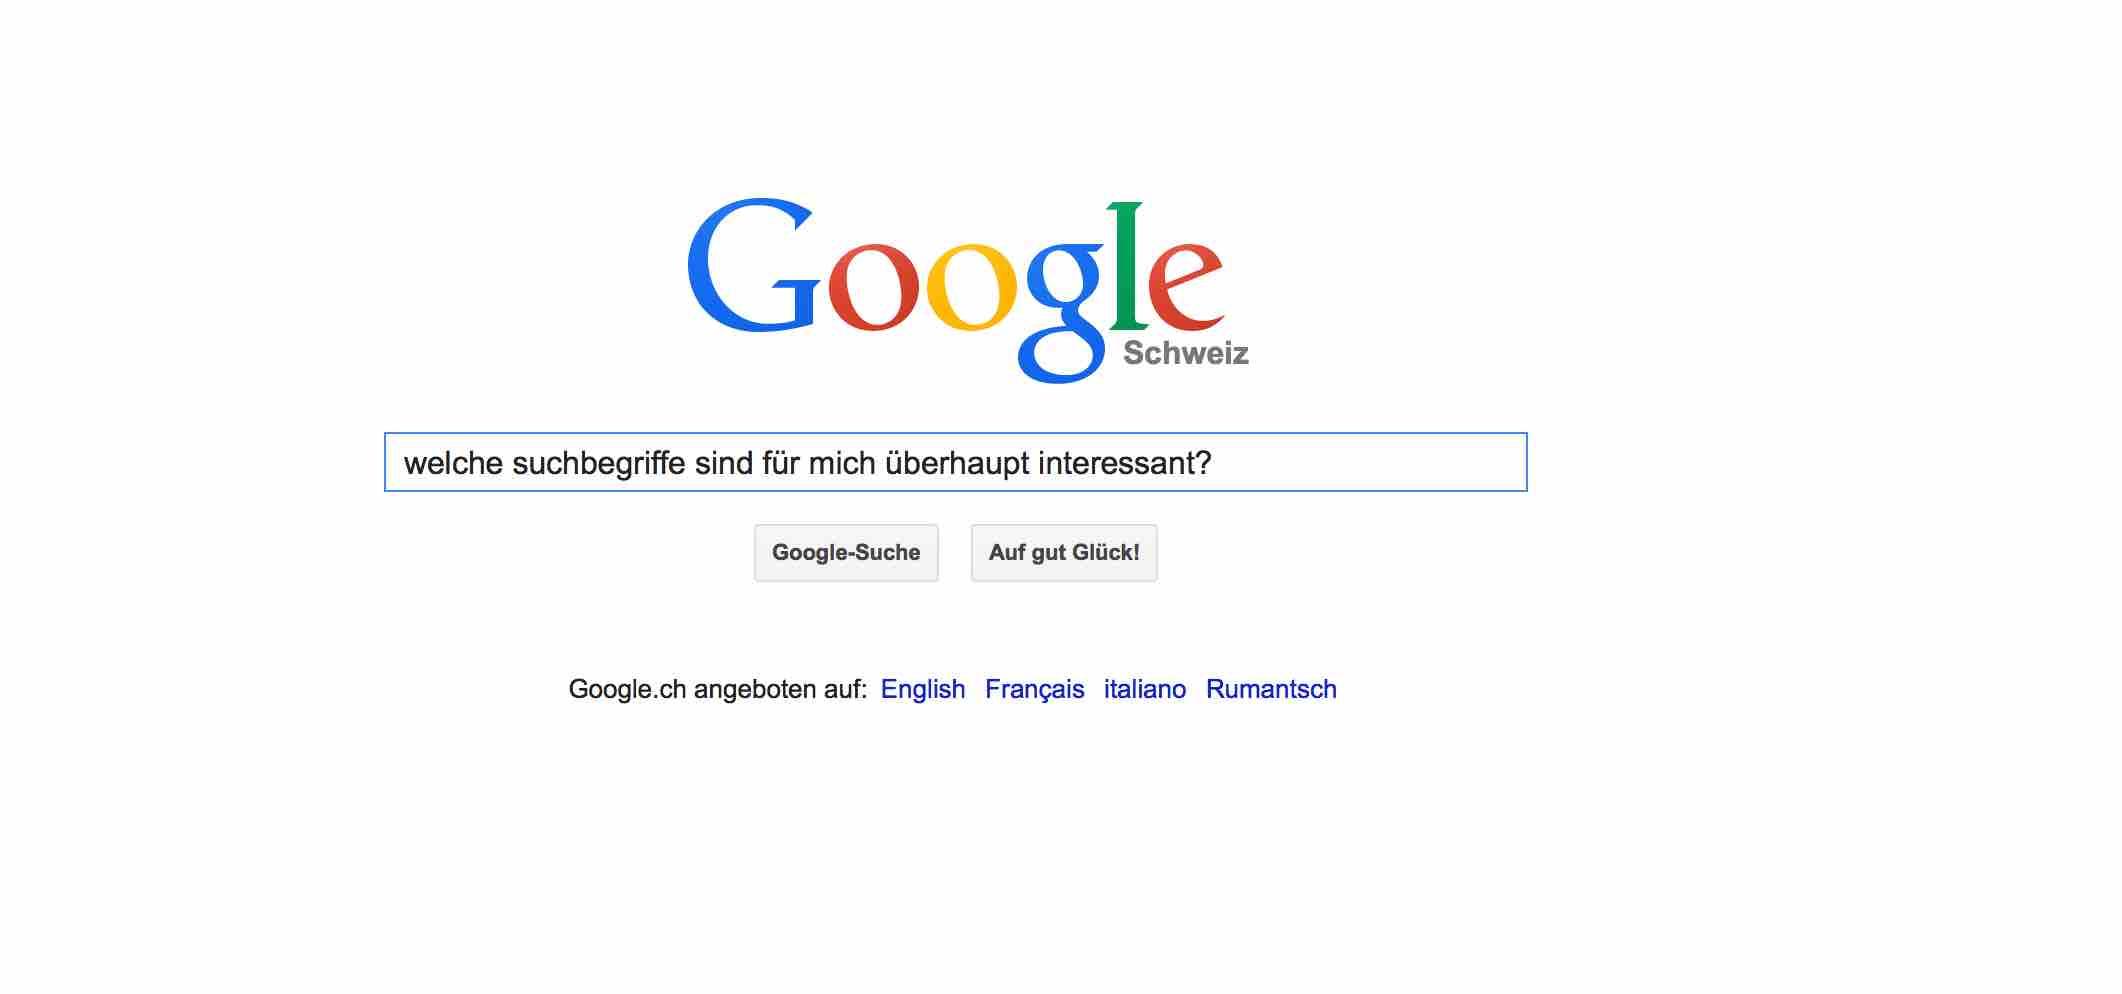 SEO Suchmaschinenoptimierung Ranking Google Platz 1